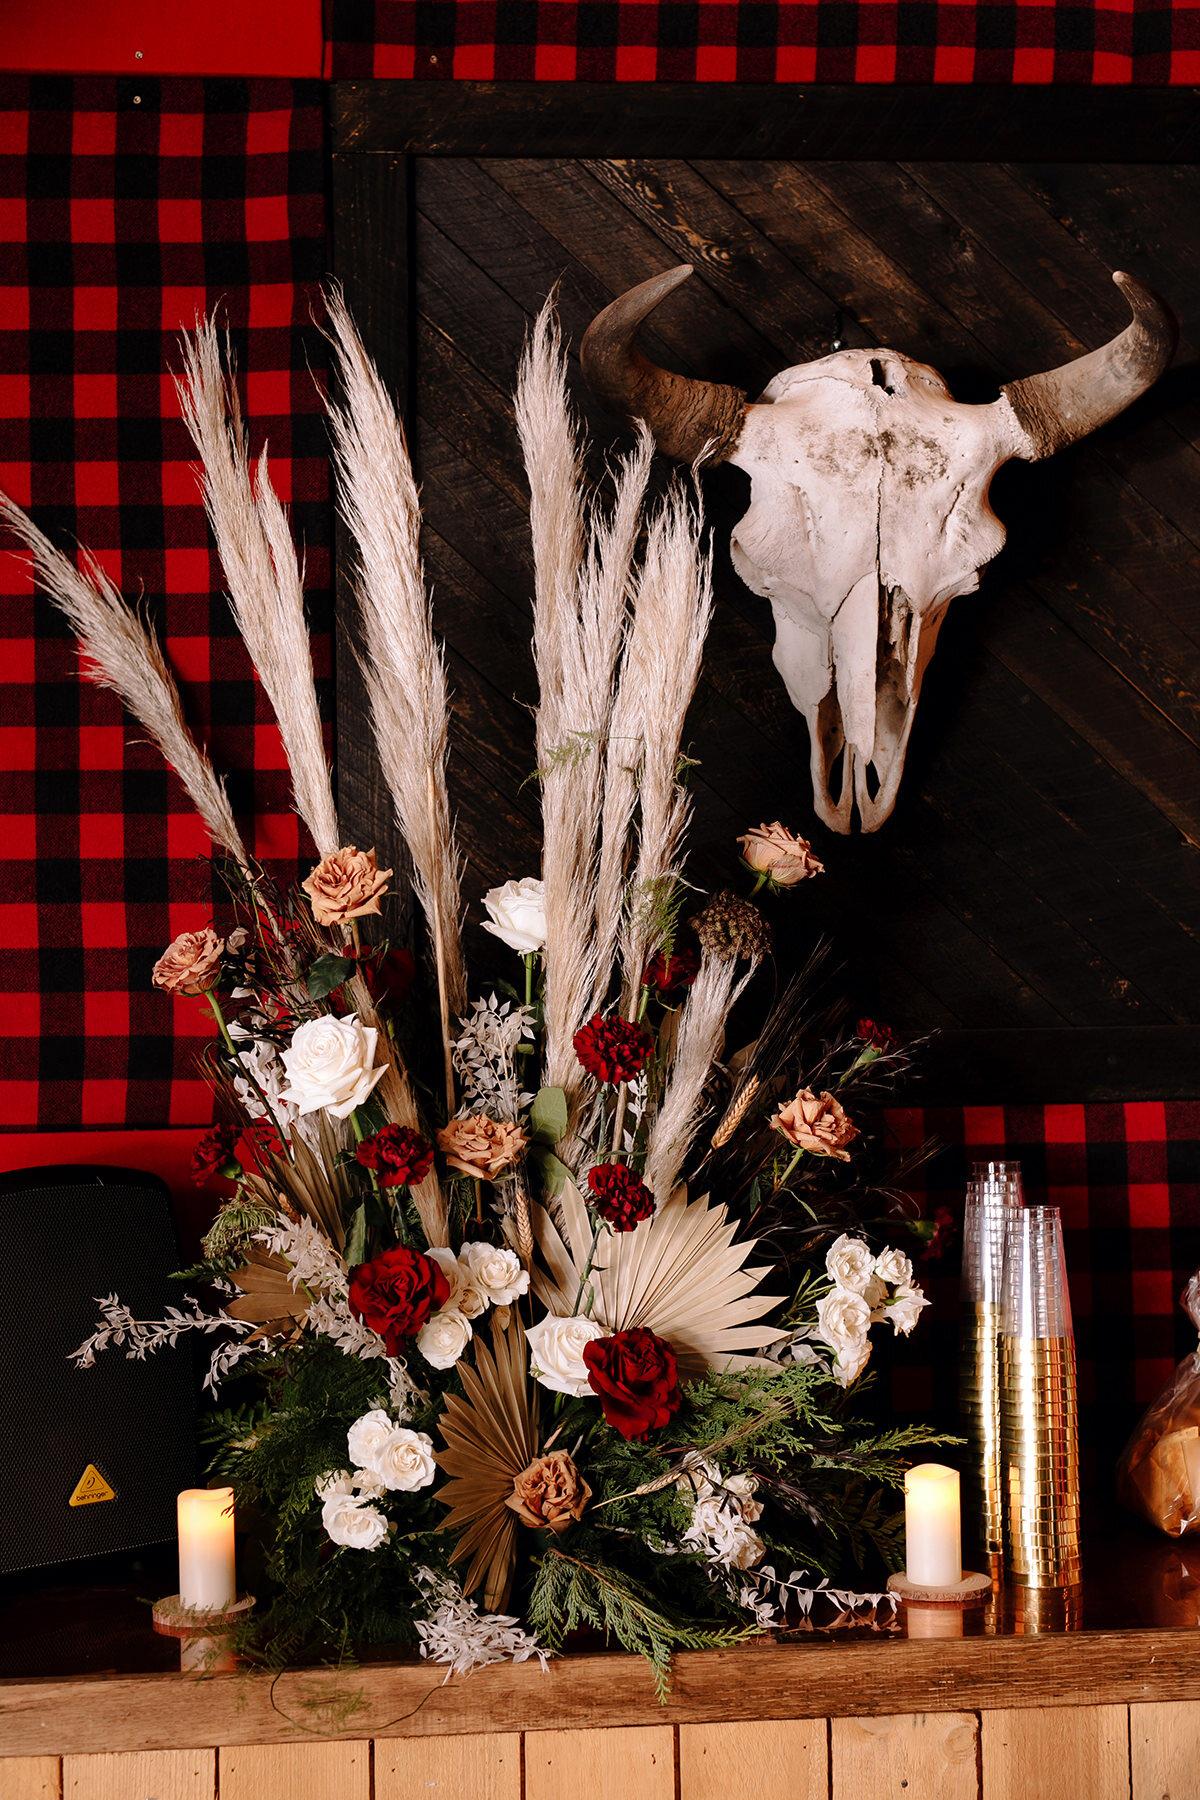 Estes Park Wedding Photographer Saint Catherine's Chapel on the Rock Avril Gown Florist Rocky Mountain National Park Denver Colorado Elopement Winter Wedding Allenspark Liz Osban Photography Destination Denver Wyoming Snowy Rue De Seine Boho